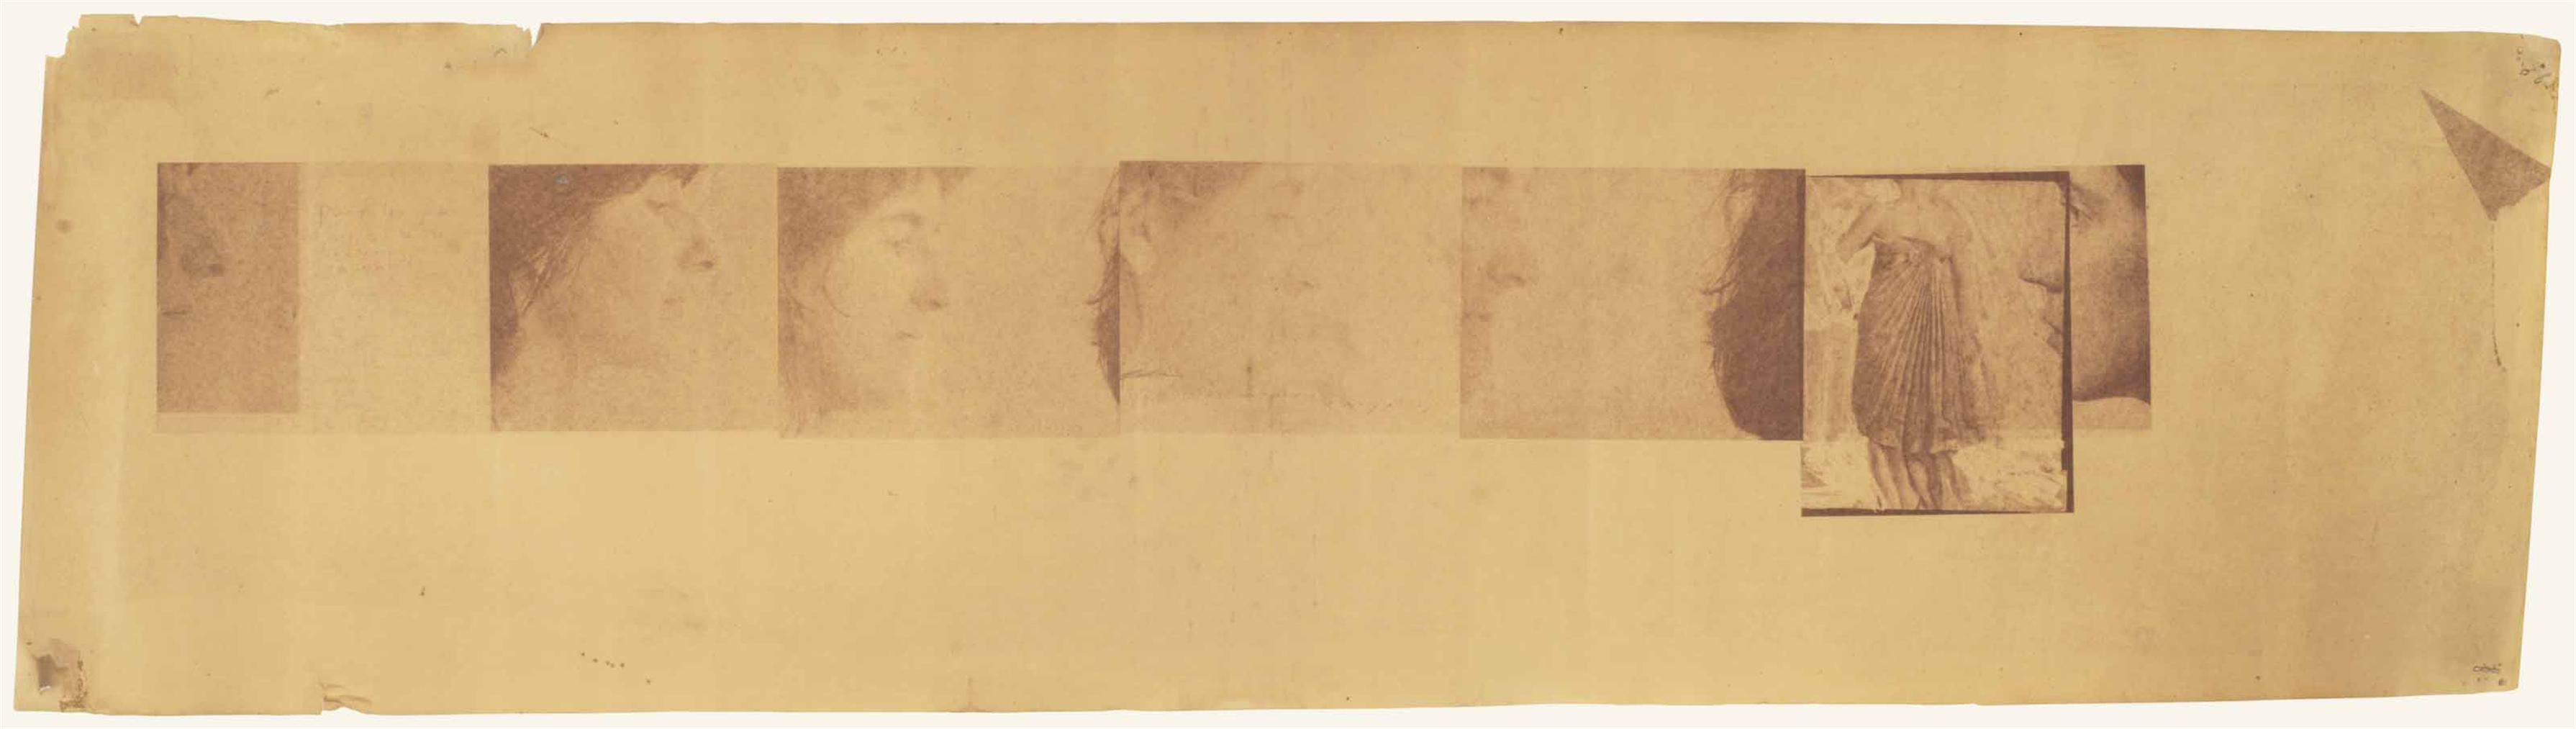 Francesca Woodman-Untitled-1980